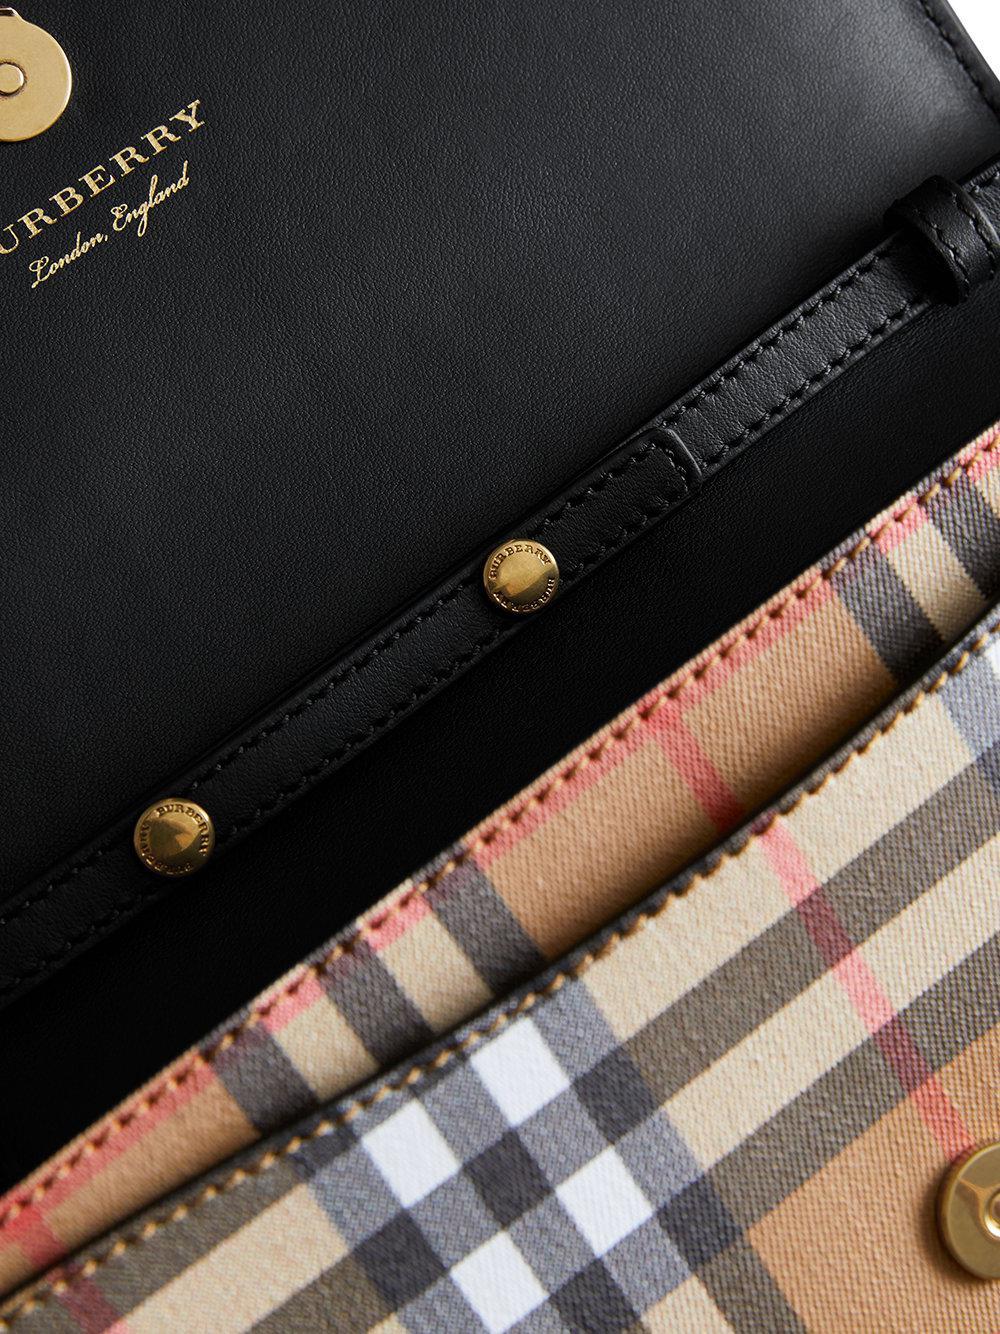 fdc6756f852d Lyst - Burberry Detachable Strap Vintage Check Leather Wallet